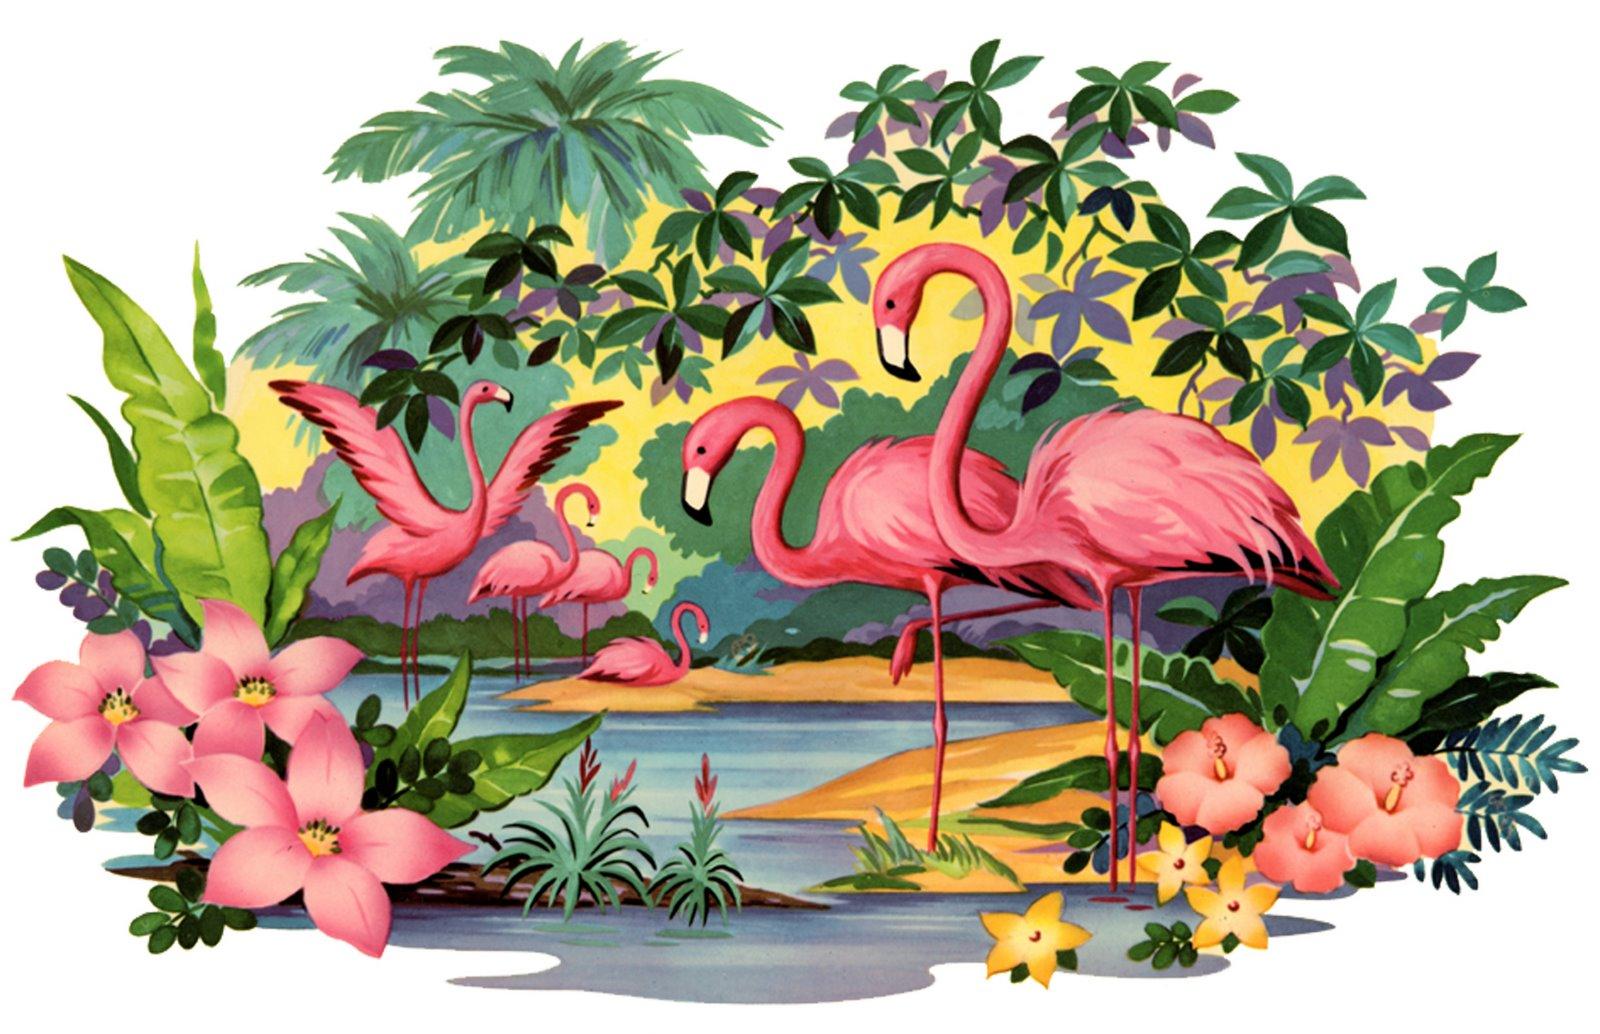 [flamingo.jpg]